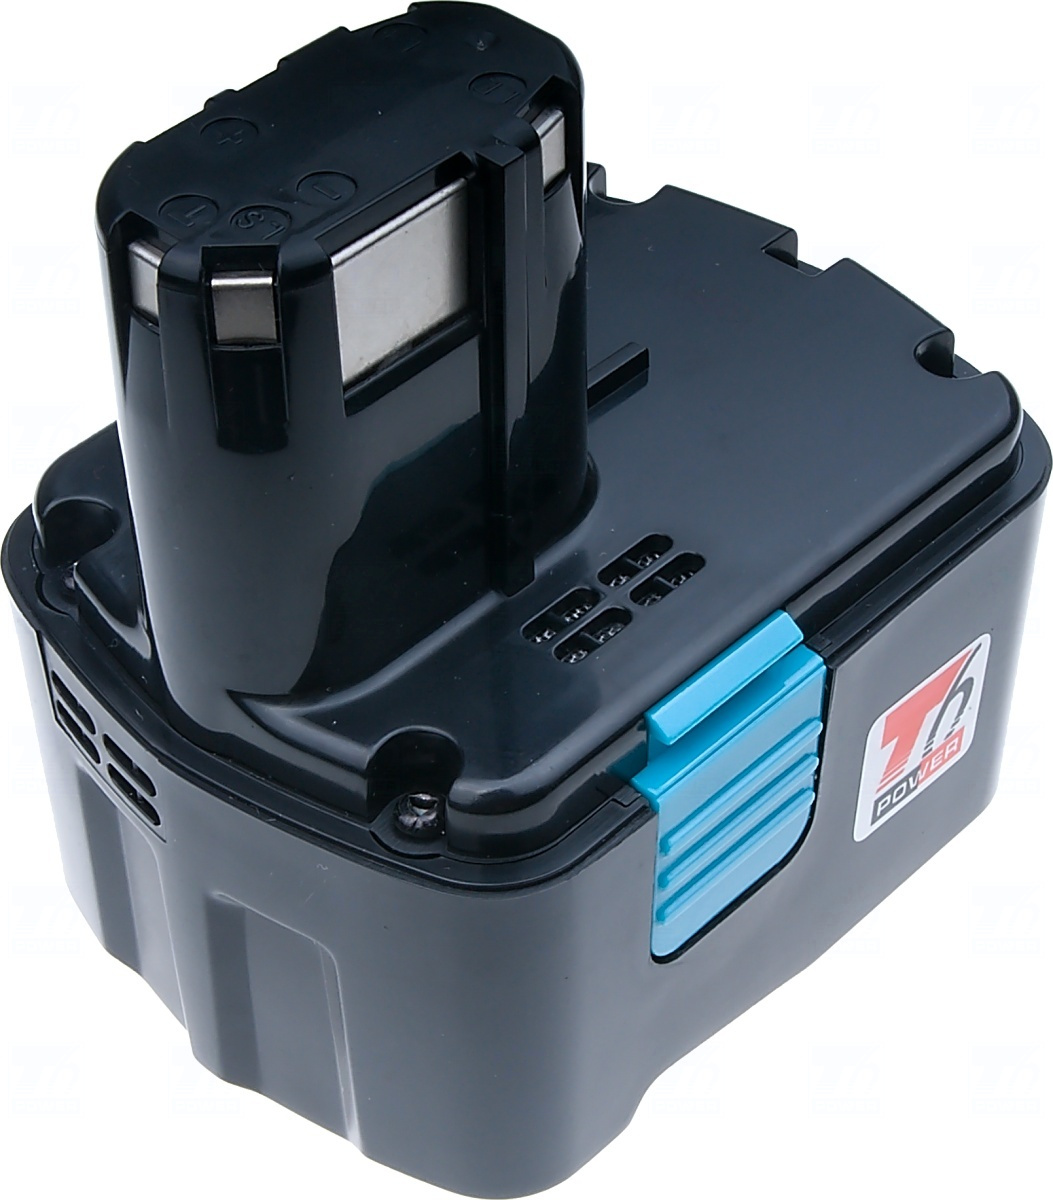 T6 power Baterie T6 power BCL 1430 PTHT0020